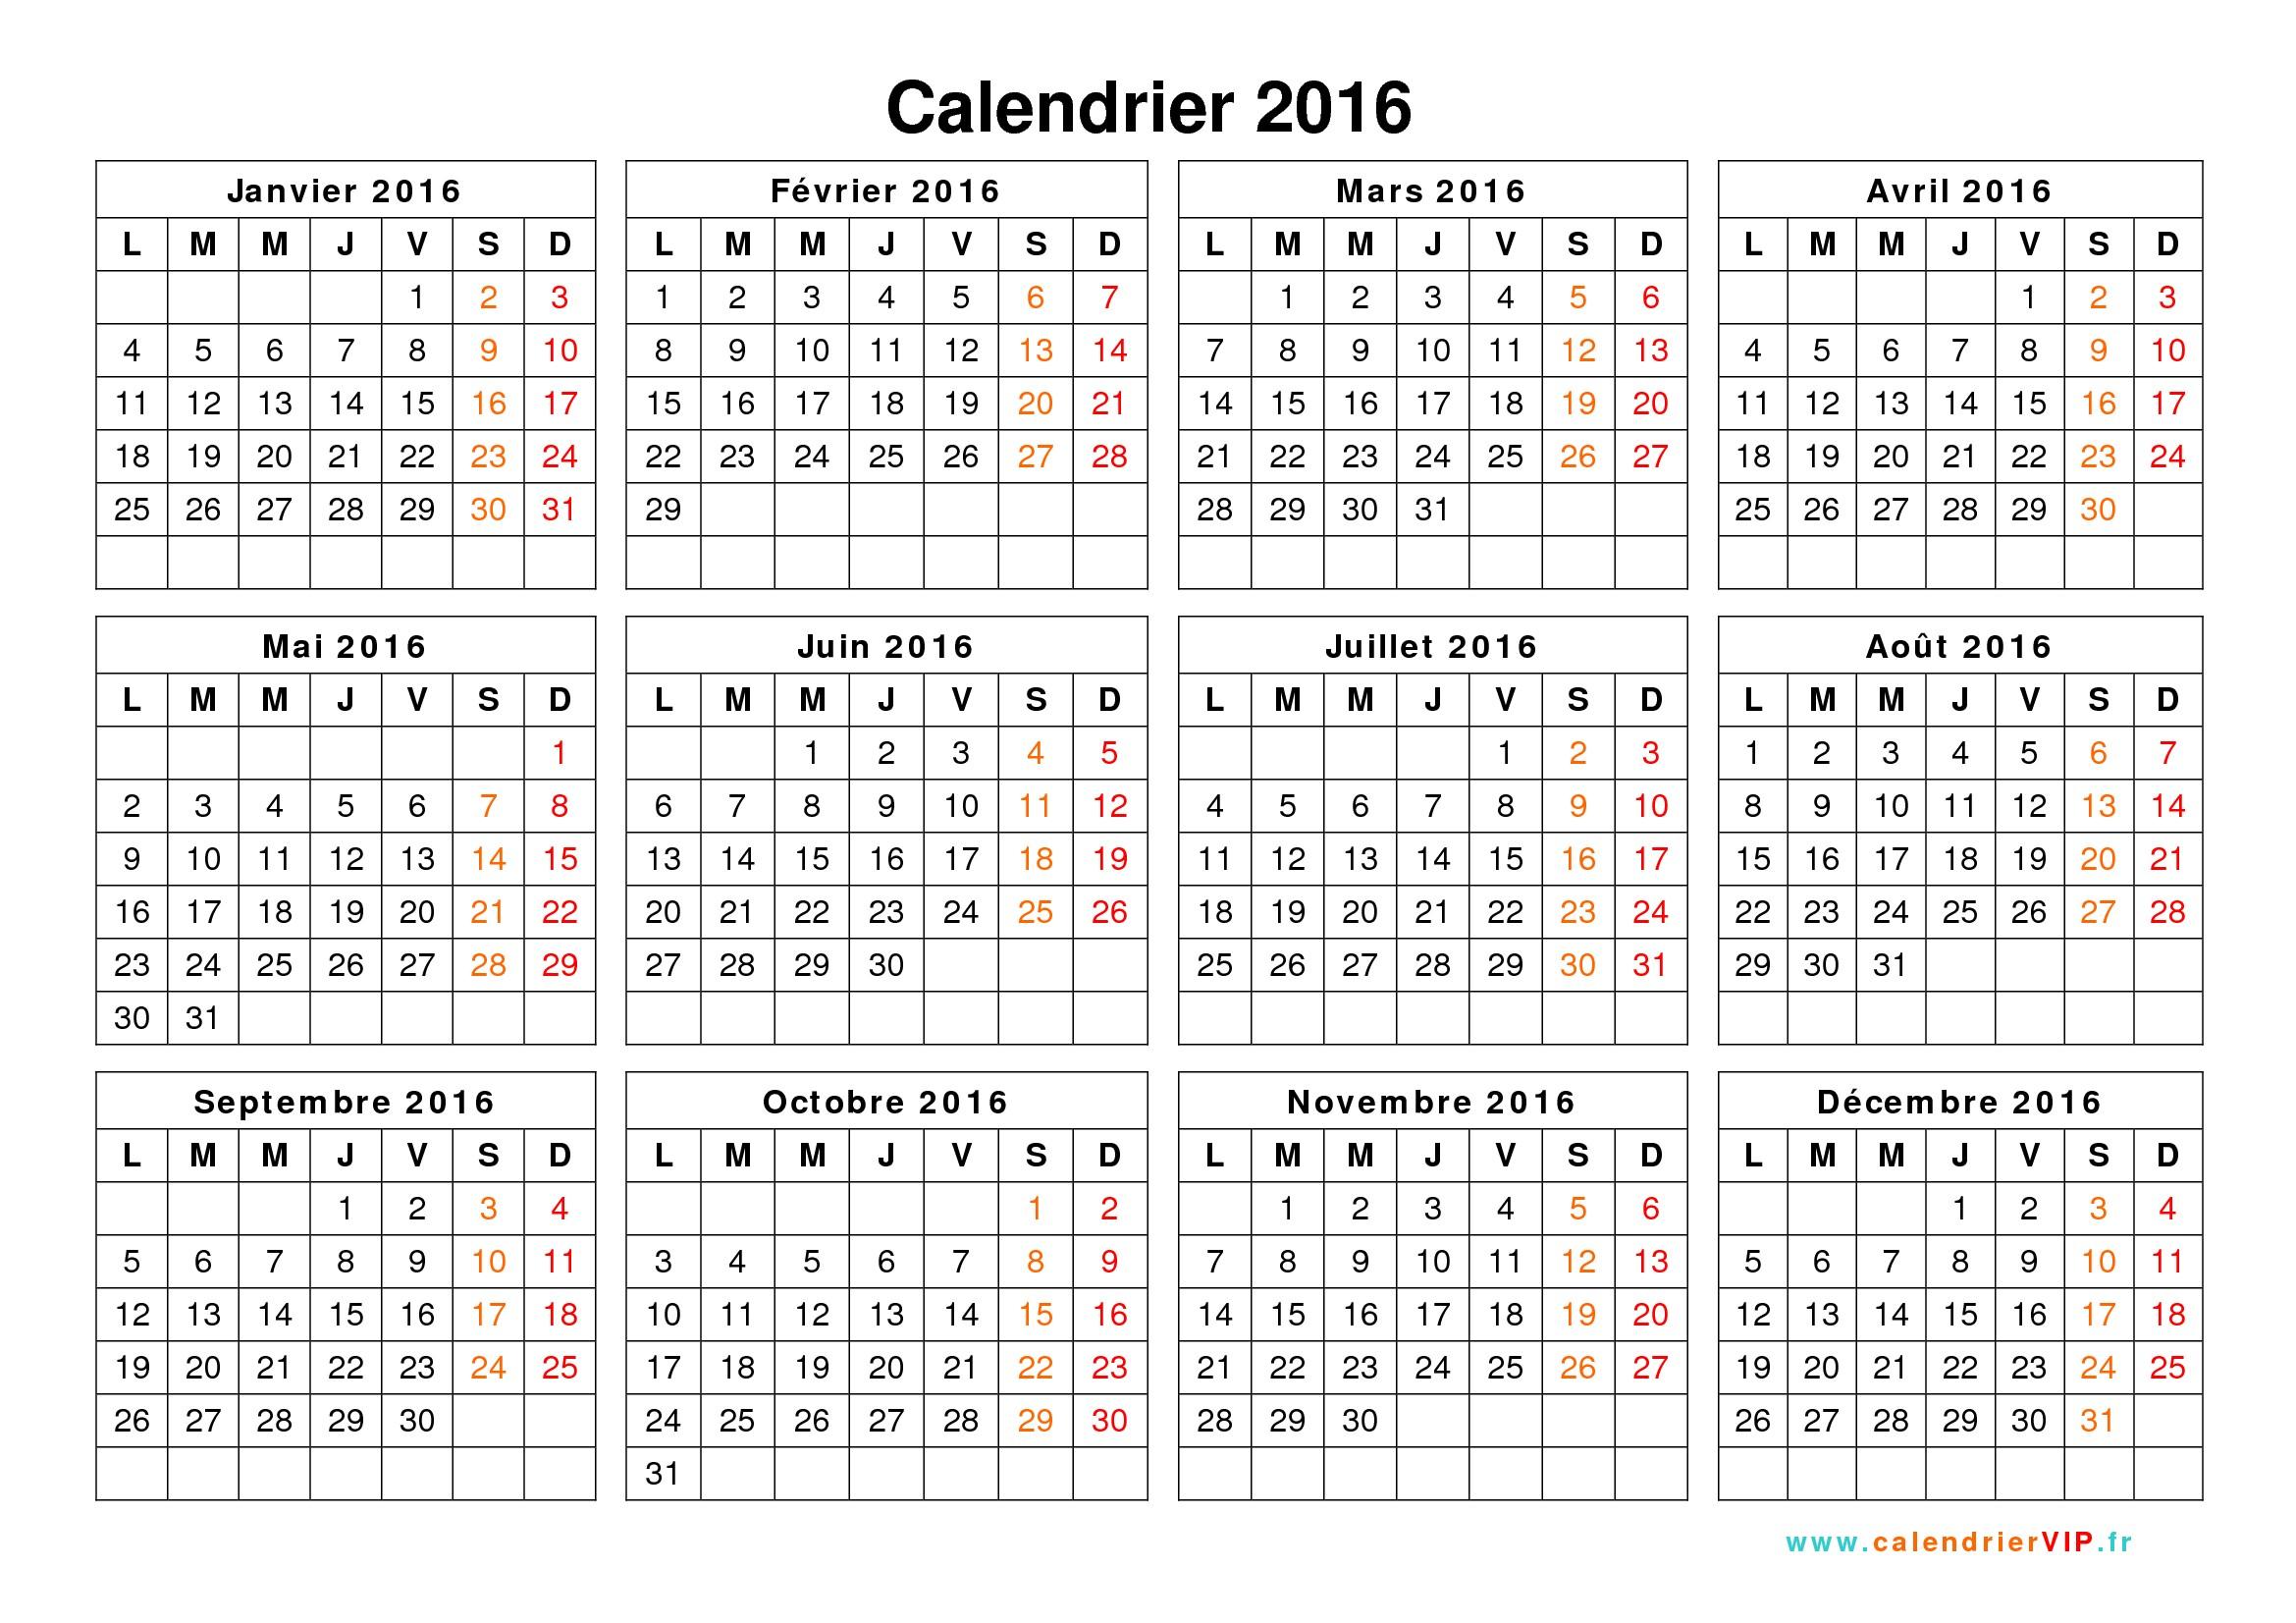 Calendario 2019 Para Imprimir Mes A Mes Más Caliente Root Of Calendario 2019 Para Imprimir Mes A Mes Más Populares Calendário 2019